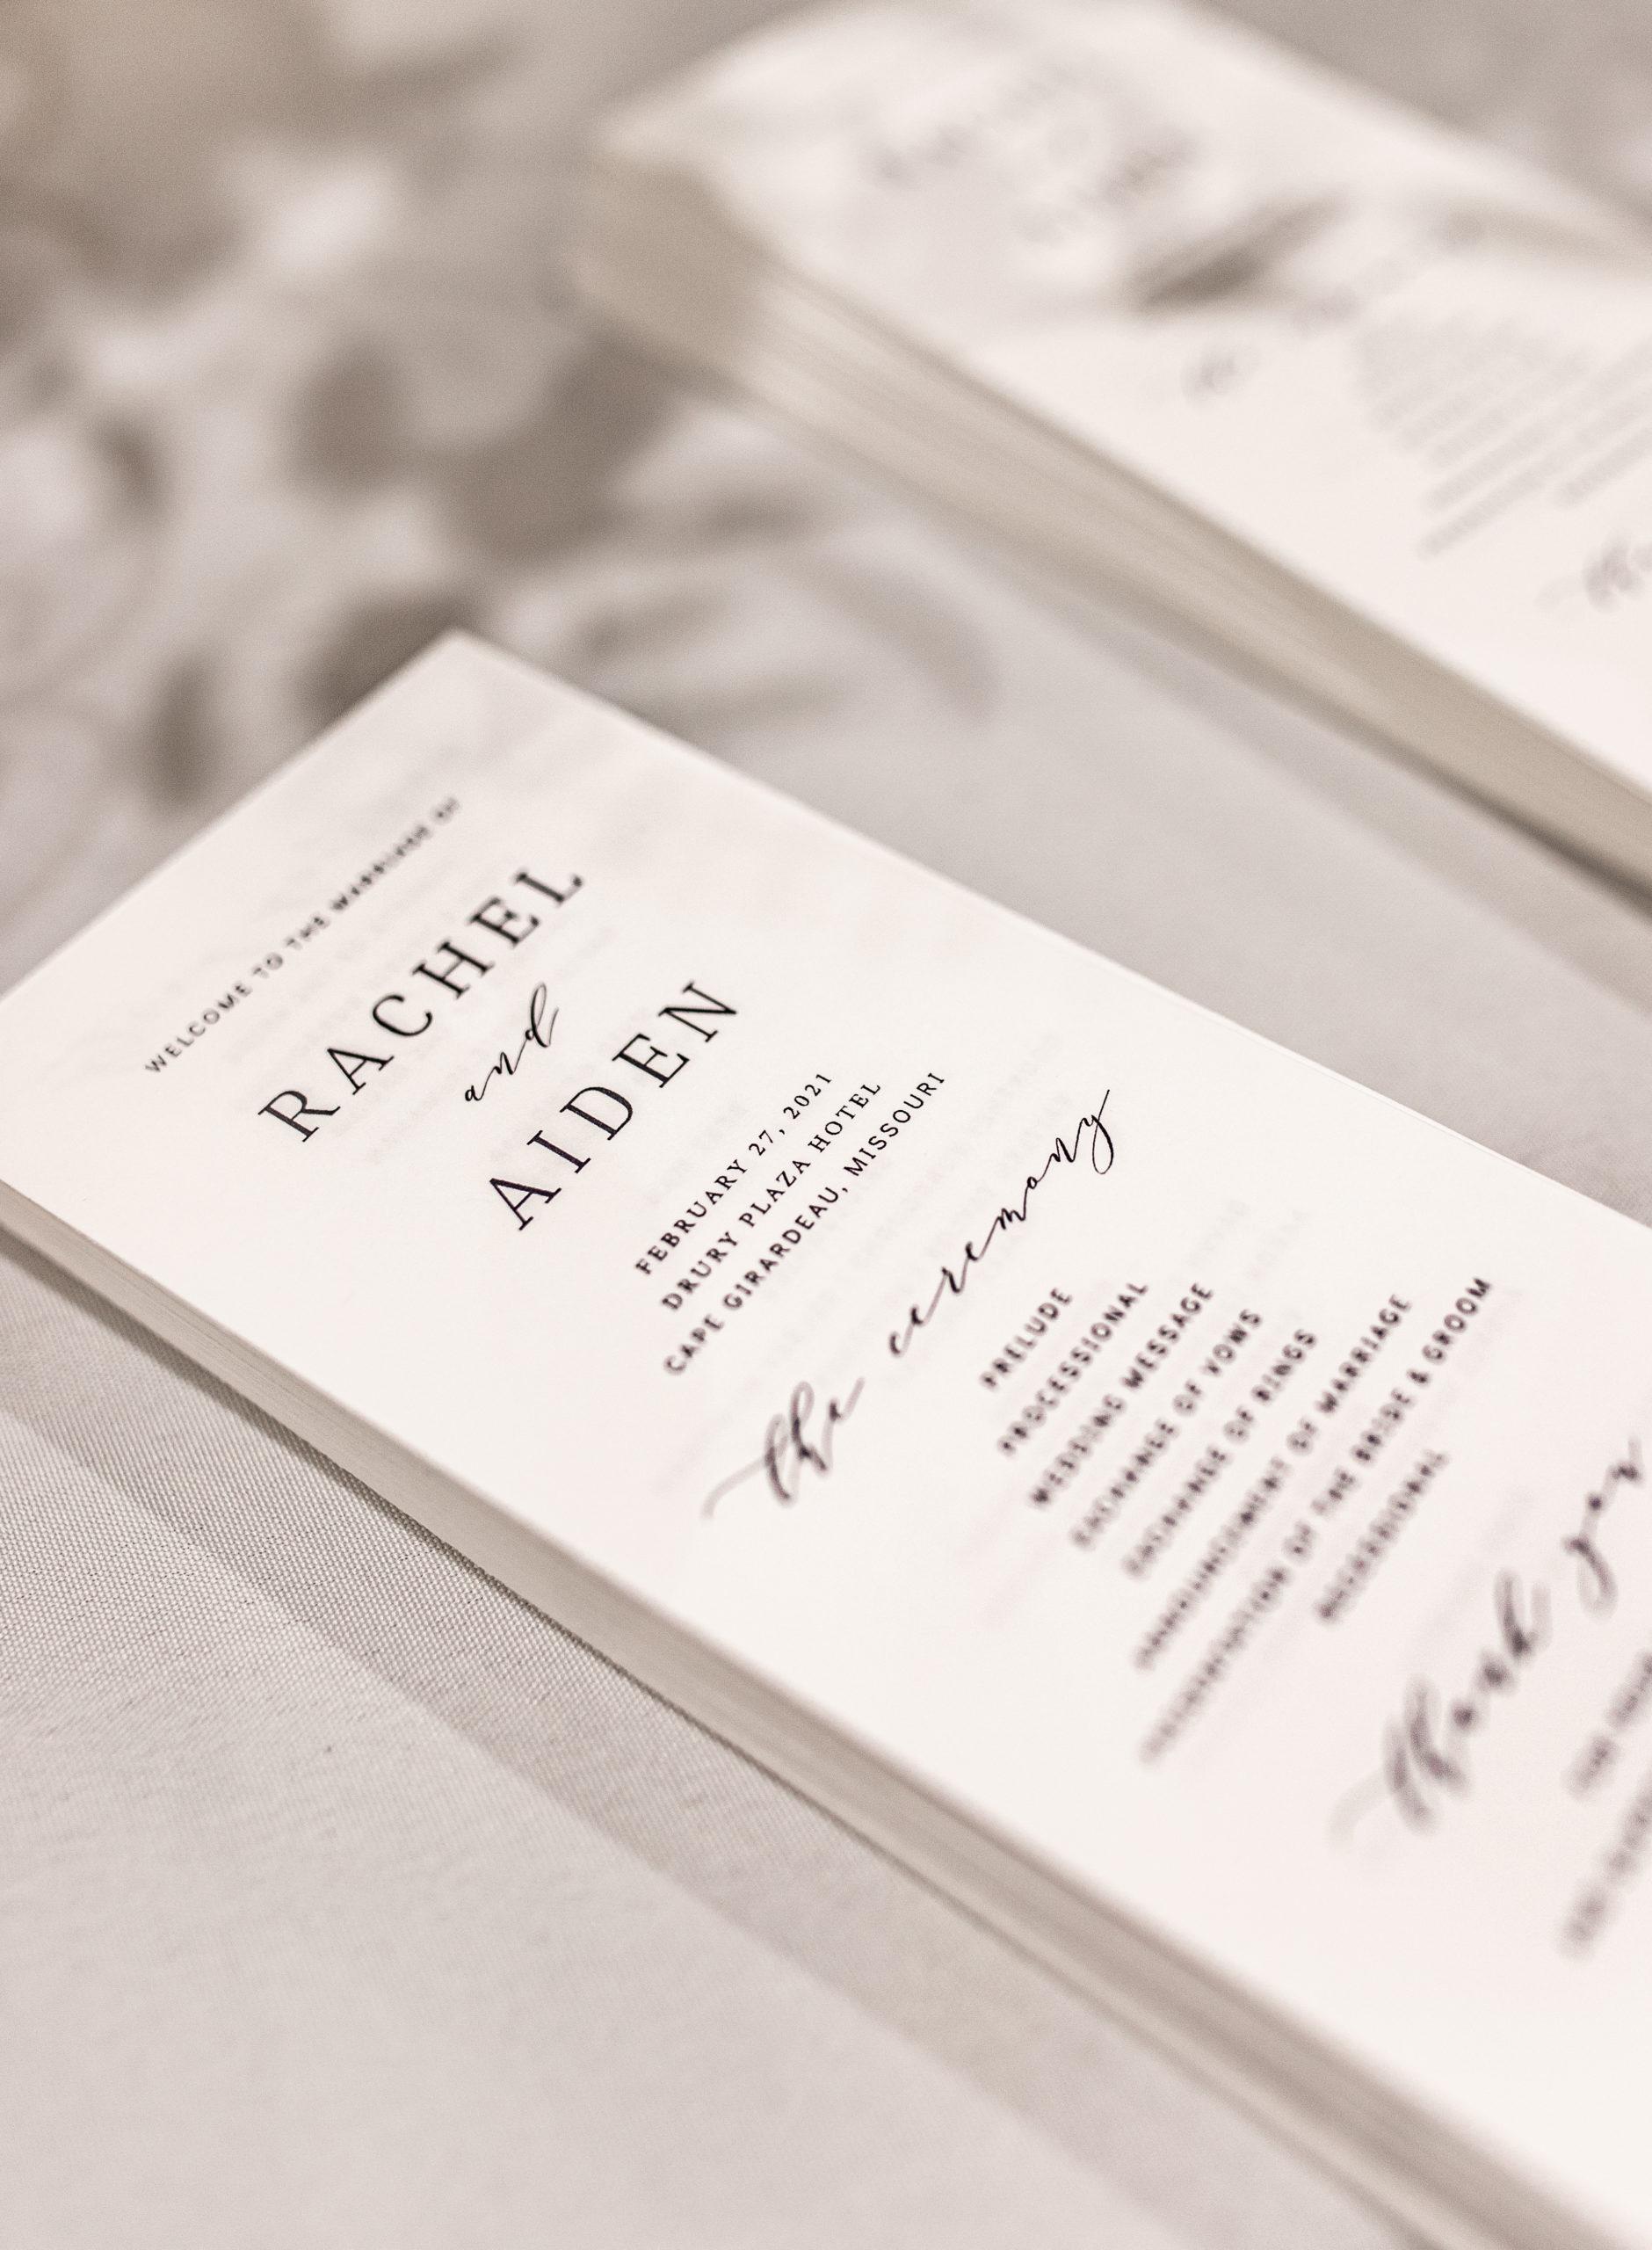 cape girardeau drury plaza hotel wedding program